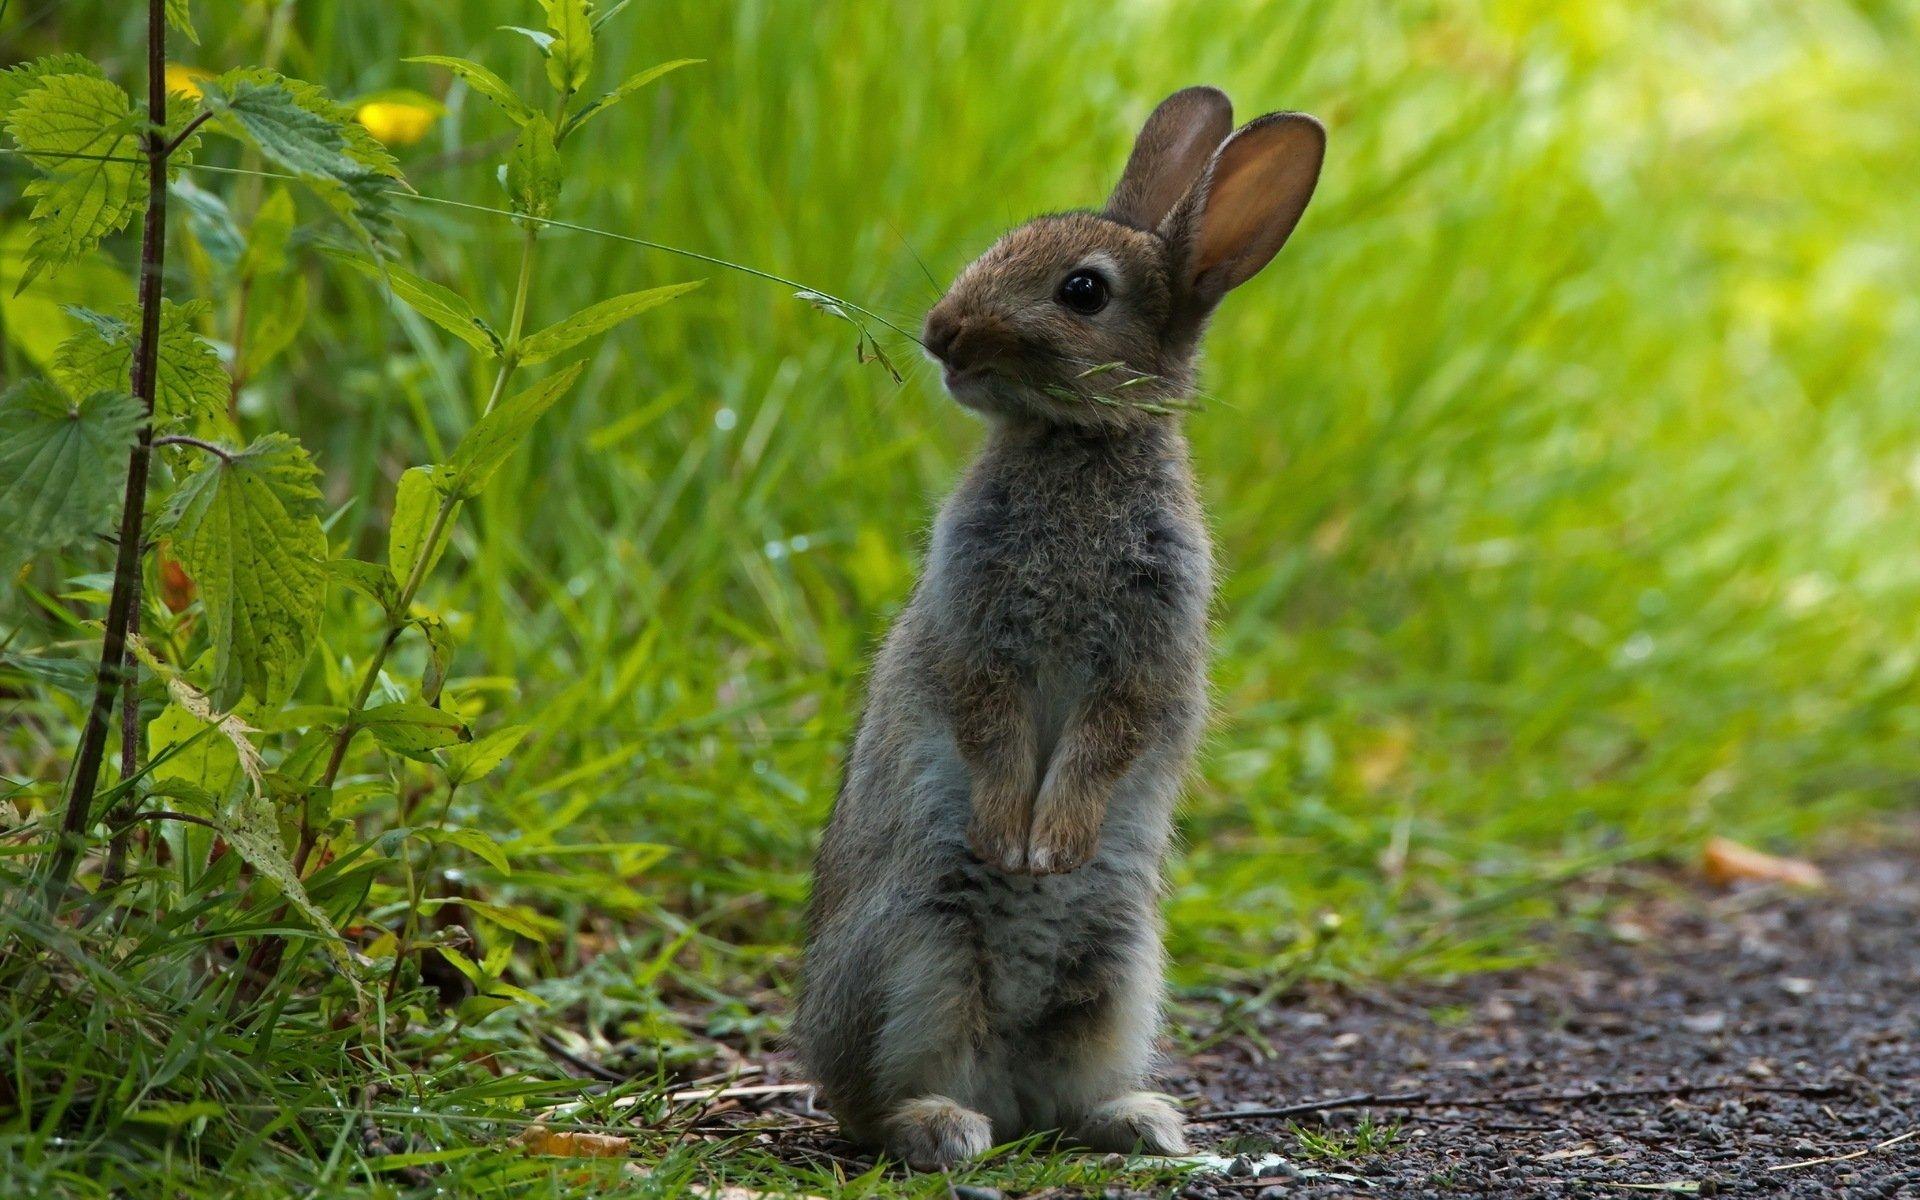 Cute Rabbits Wallpapers Hd Lapin Full Hd Fond D 233 Cran And Arri 232 Re Plan 1920x1200